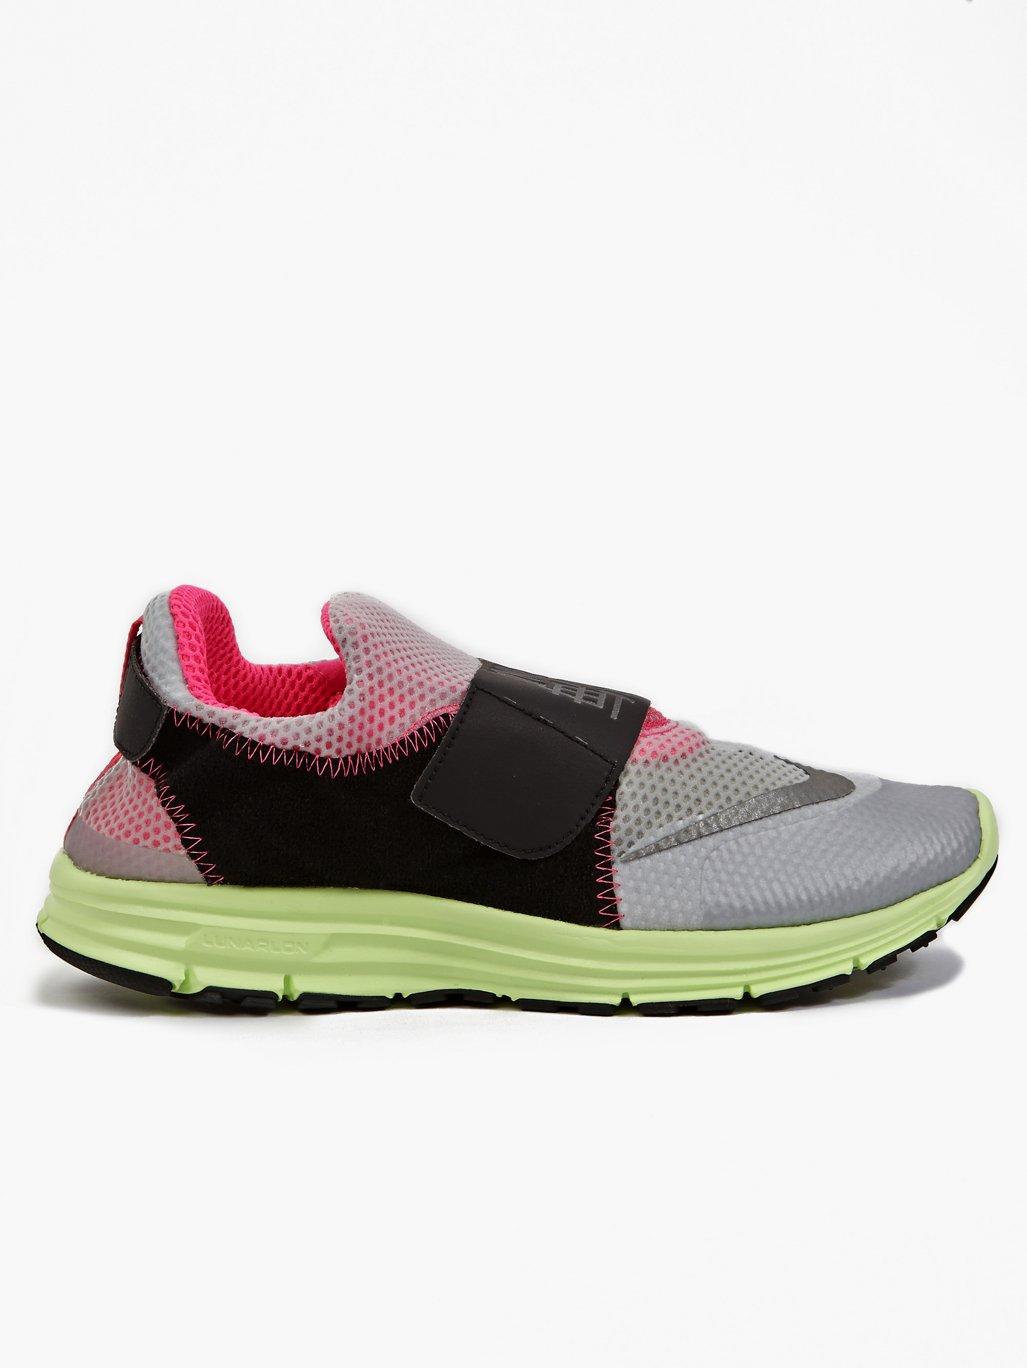 Nike Men's Black Lunarfly 306 City QS Shanghai Sneakers